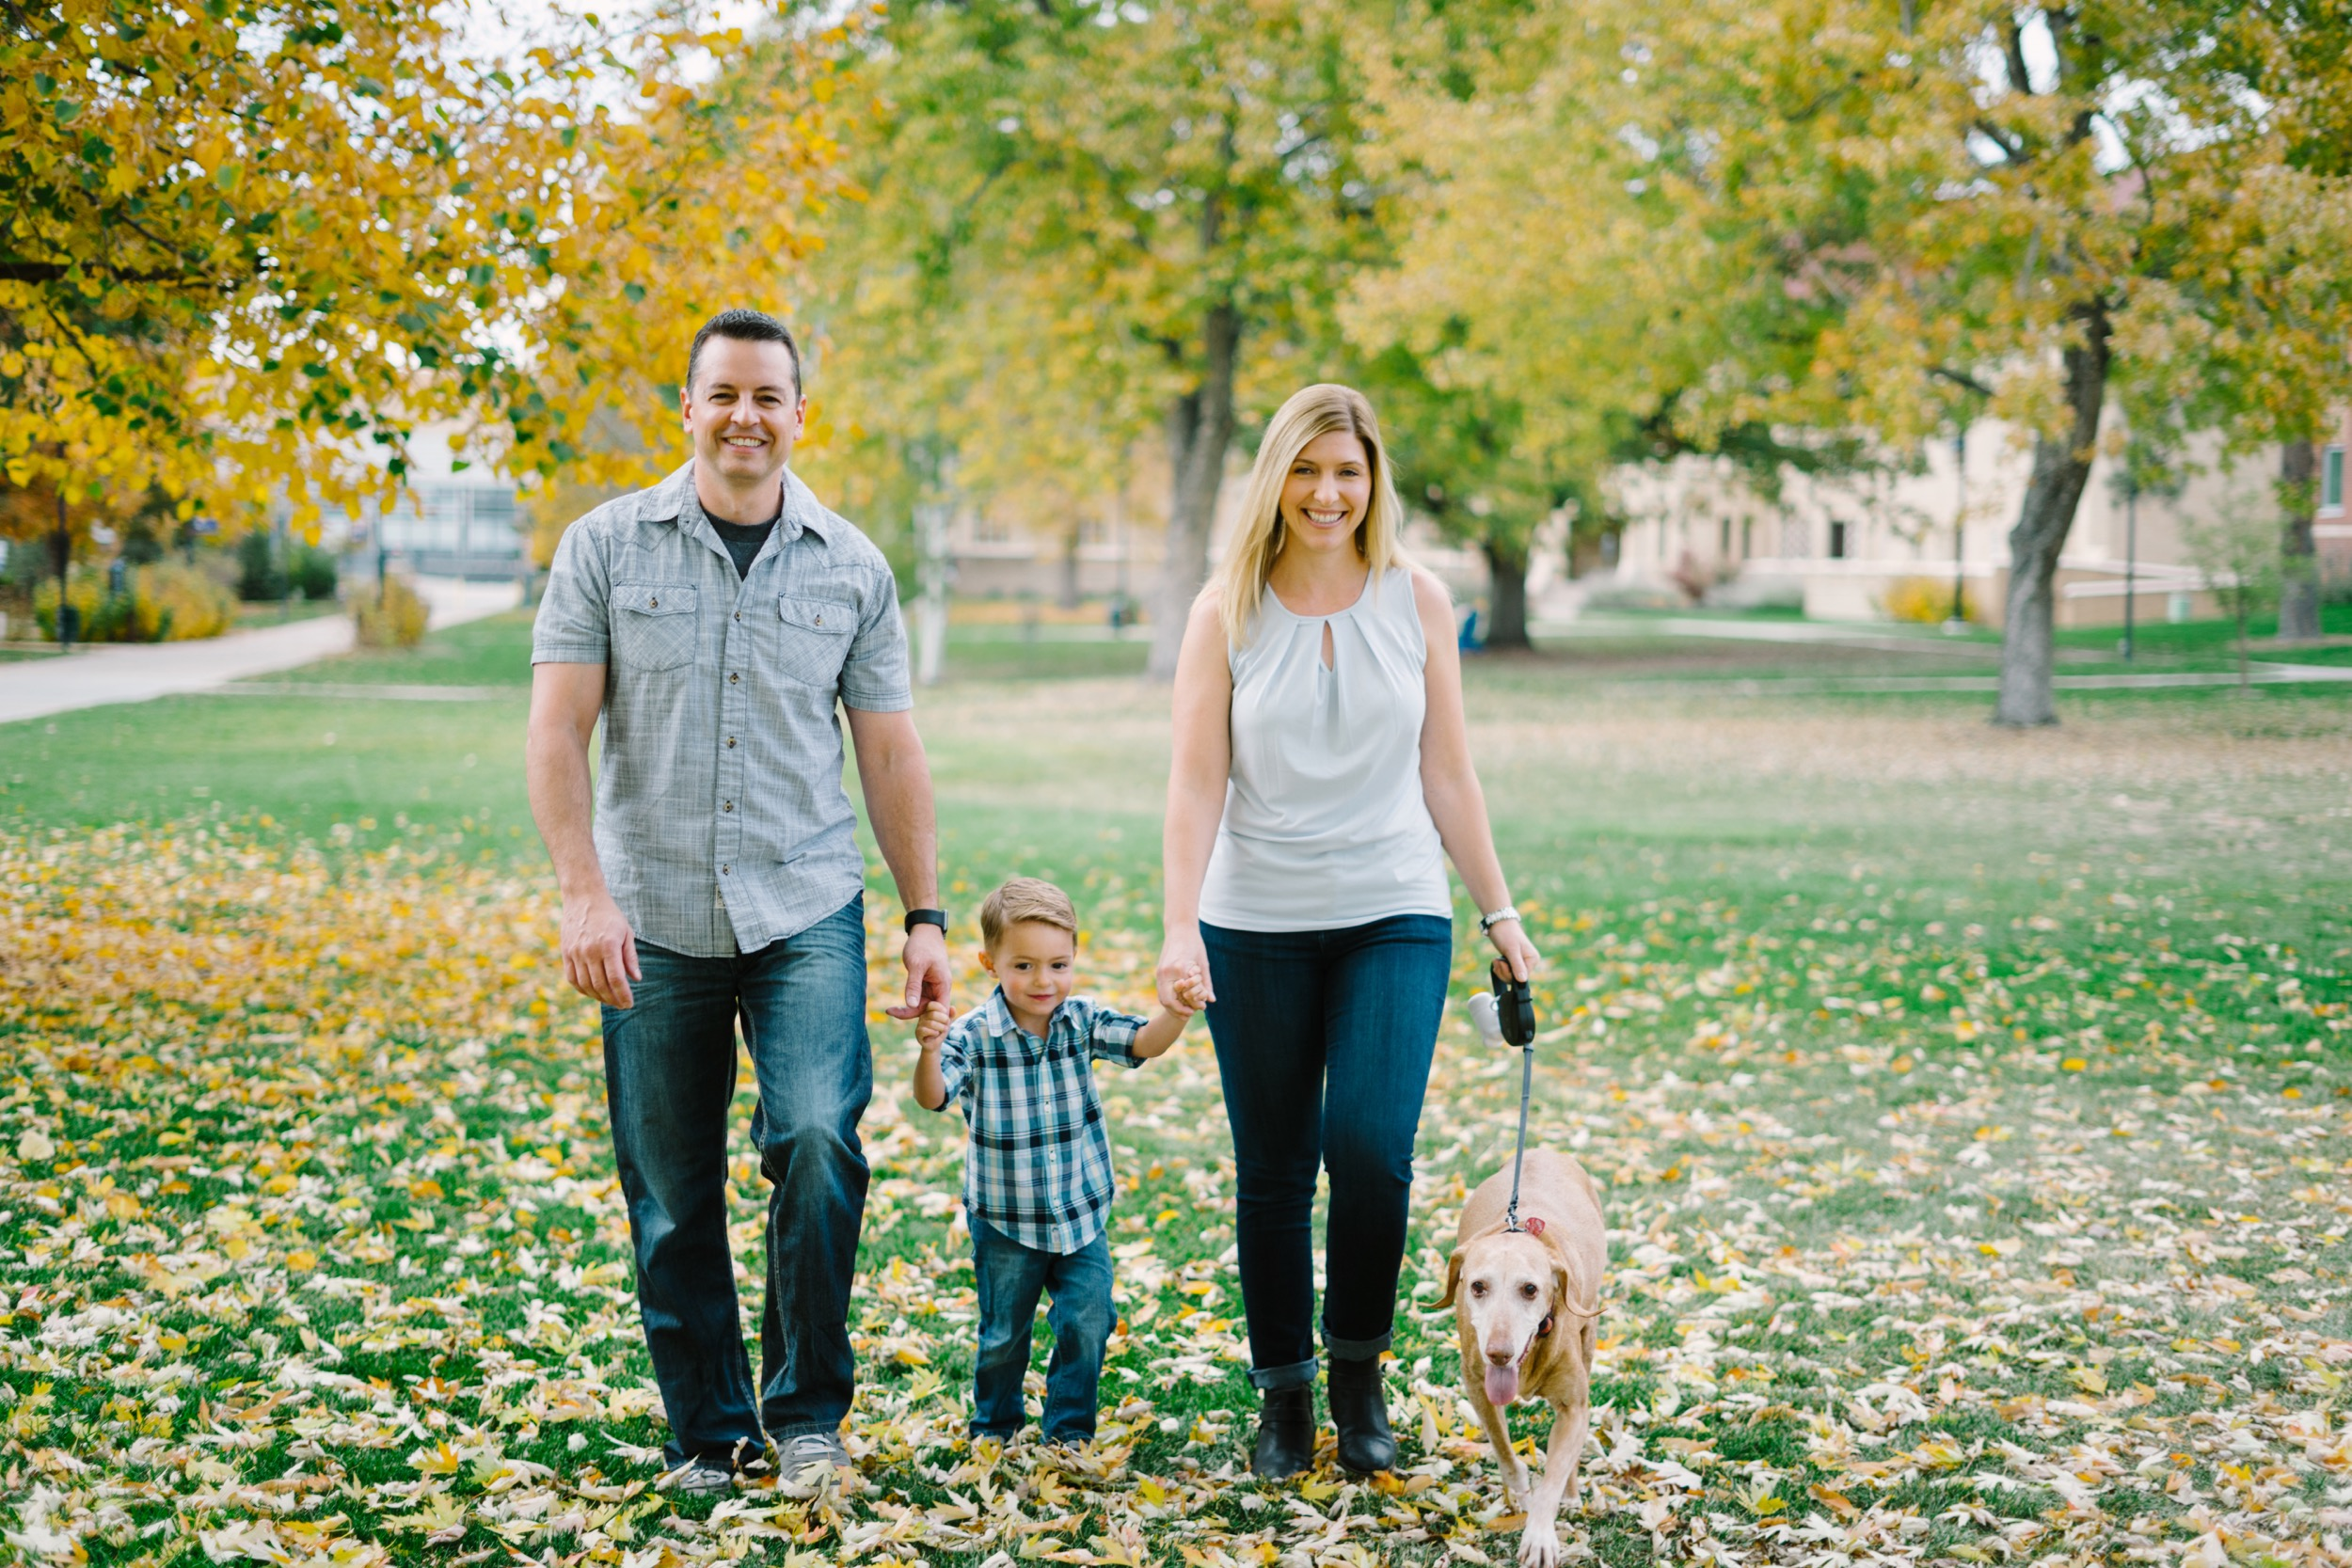 Denver Family Photography Dr. Bates - 4.jpg